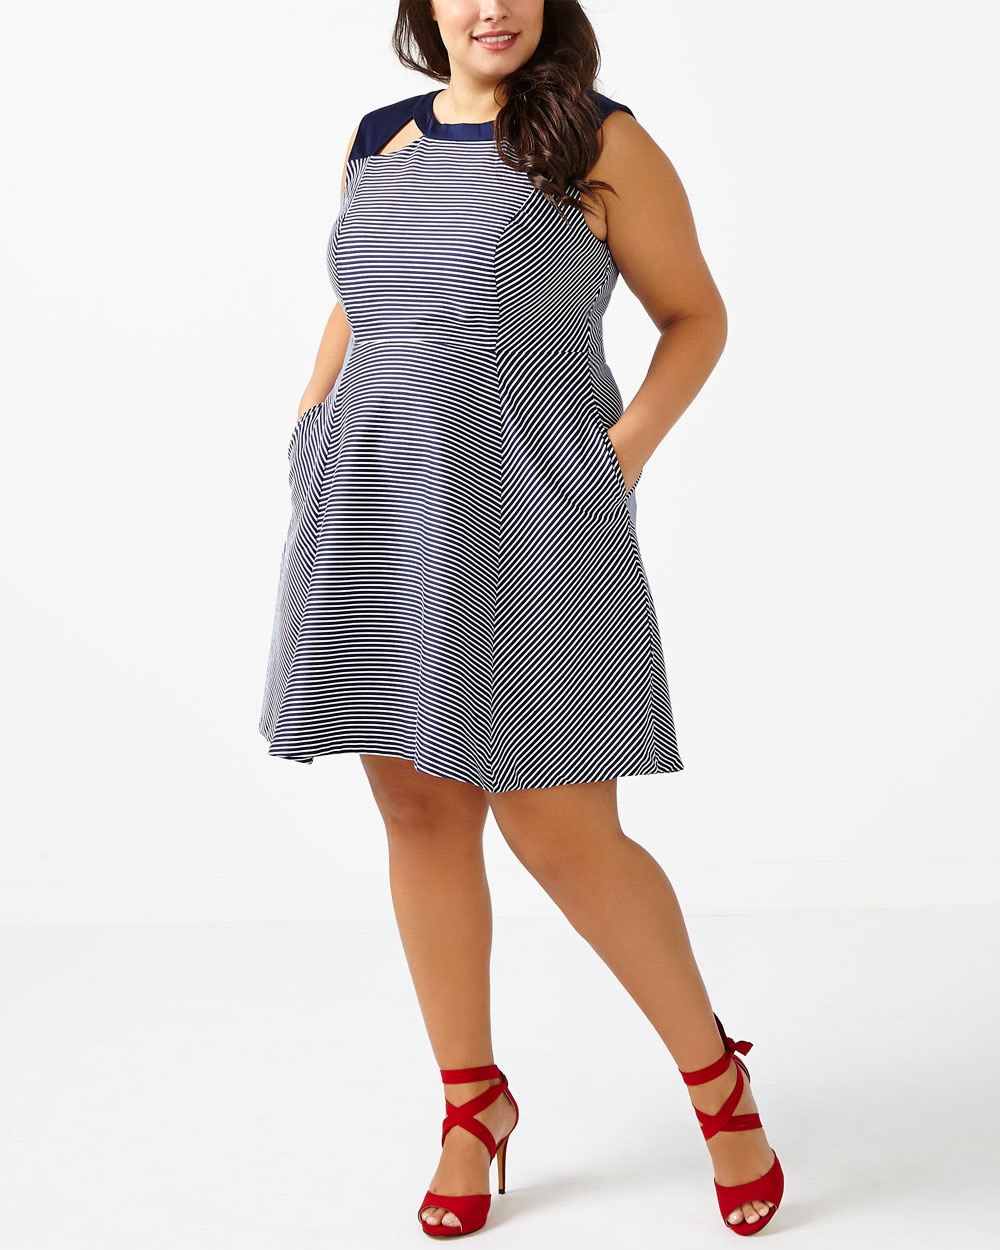 Hallelujah dress fashions edmonton